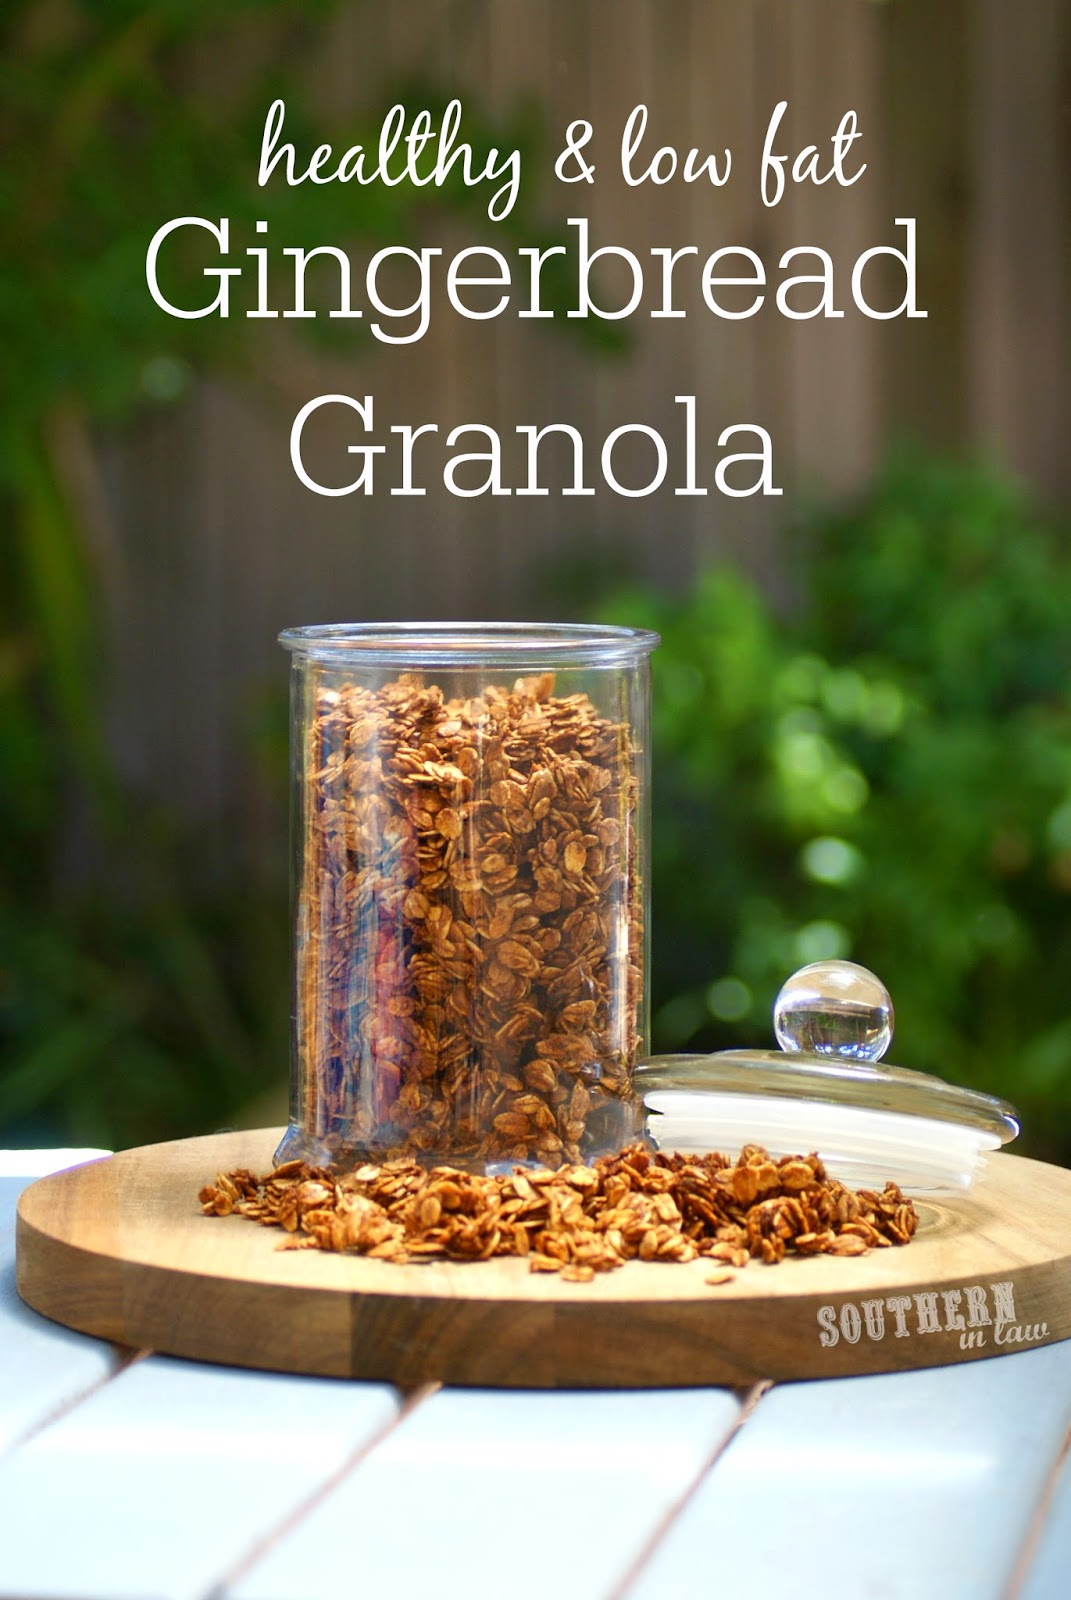 Gluten Free Gingerbread Granola Recipe - low fat, gluten free, healthy, clean eating friendly, christmas gift ideas